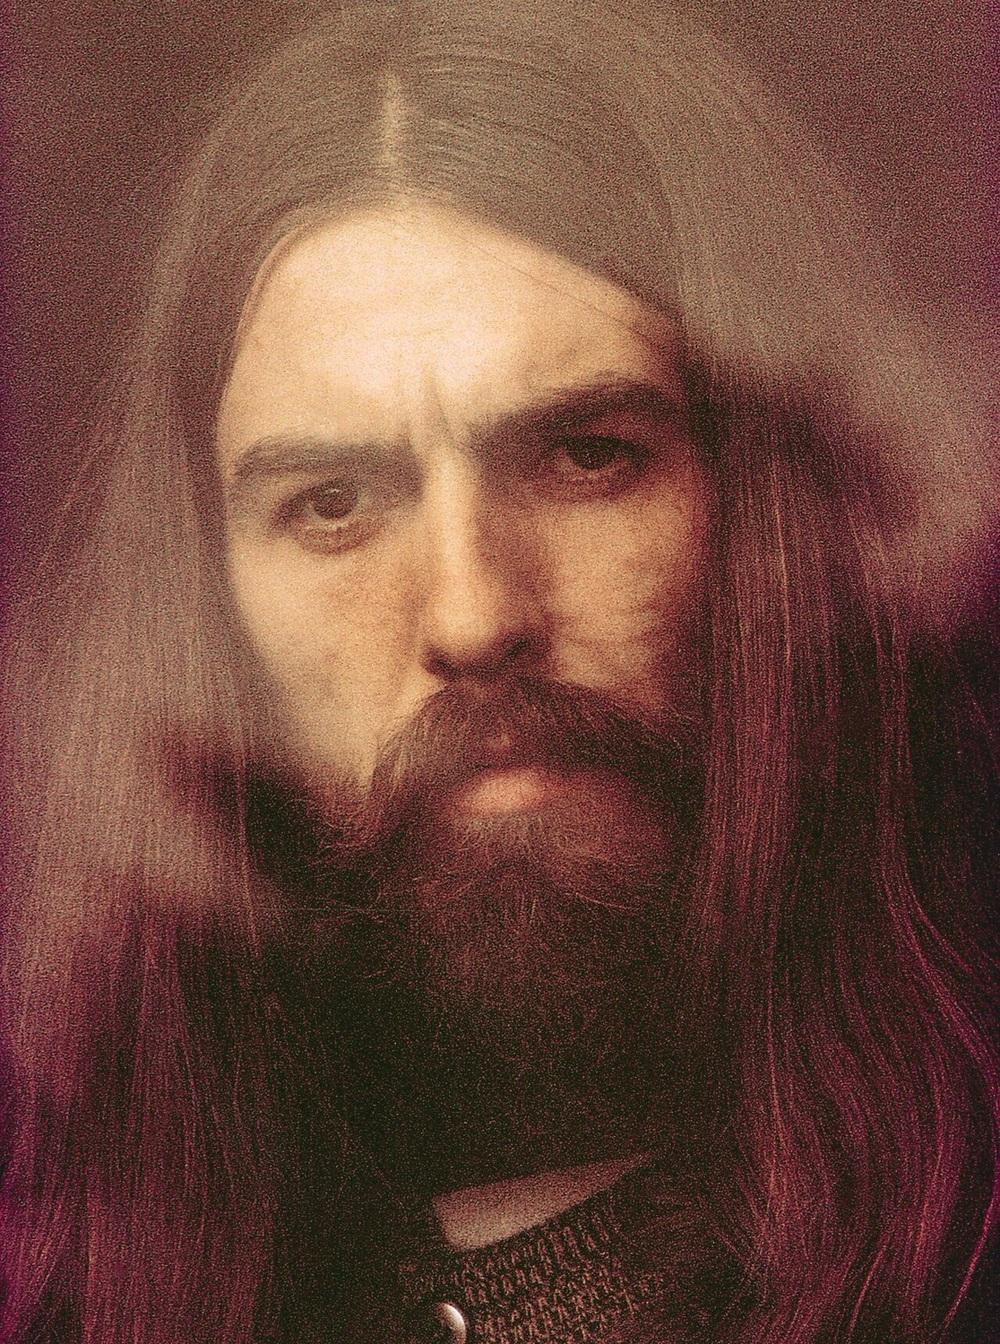 George Harrison circa 1970.